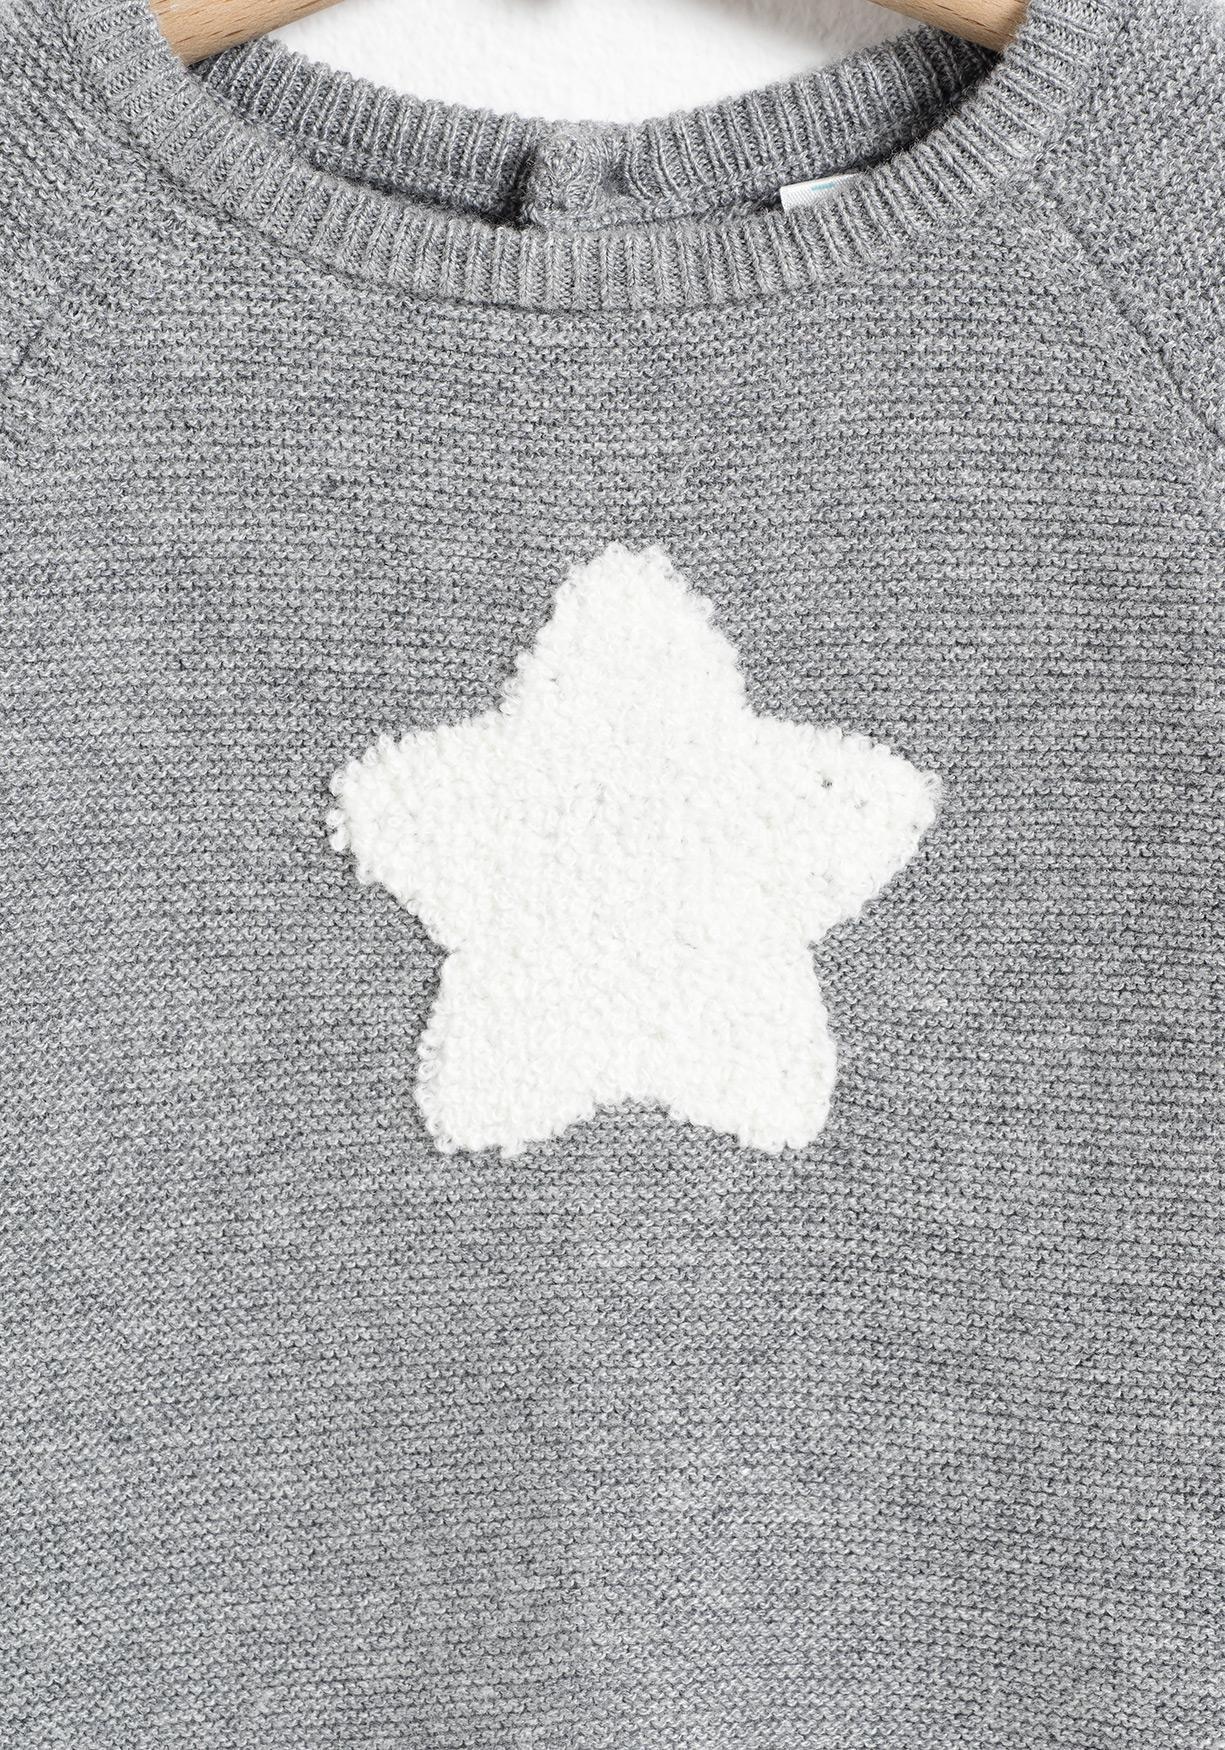 8fab40cad Comprar Jersey de manga larga para recién nacido unisex TEX ...